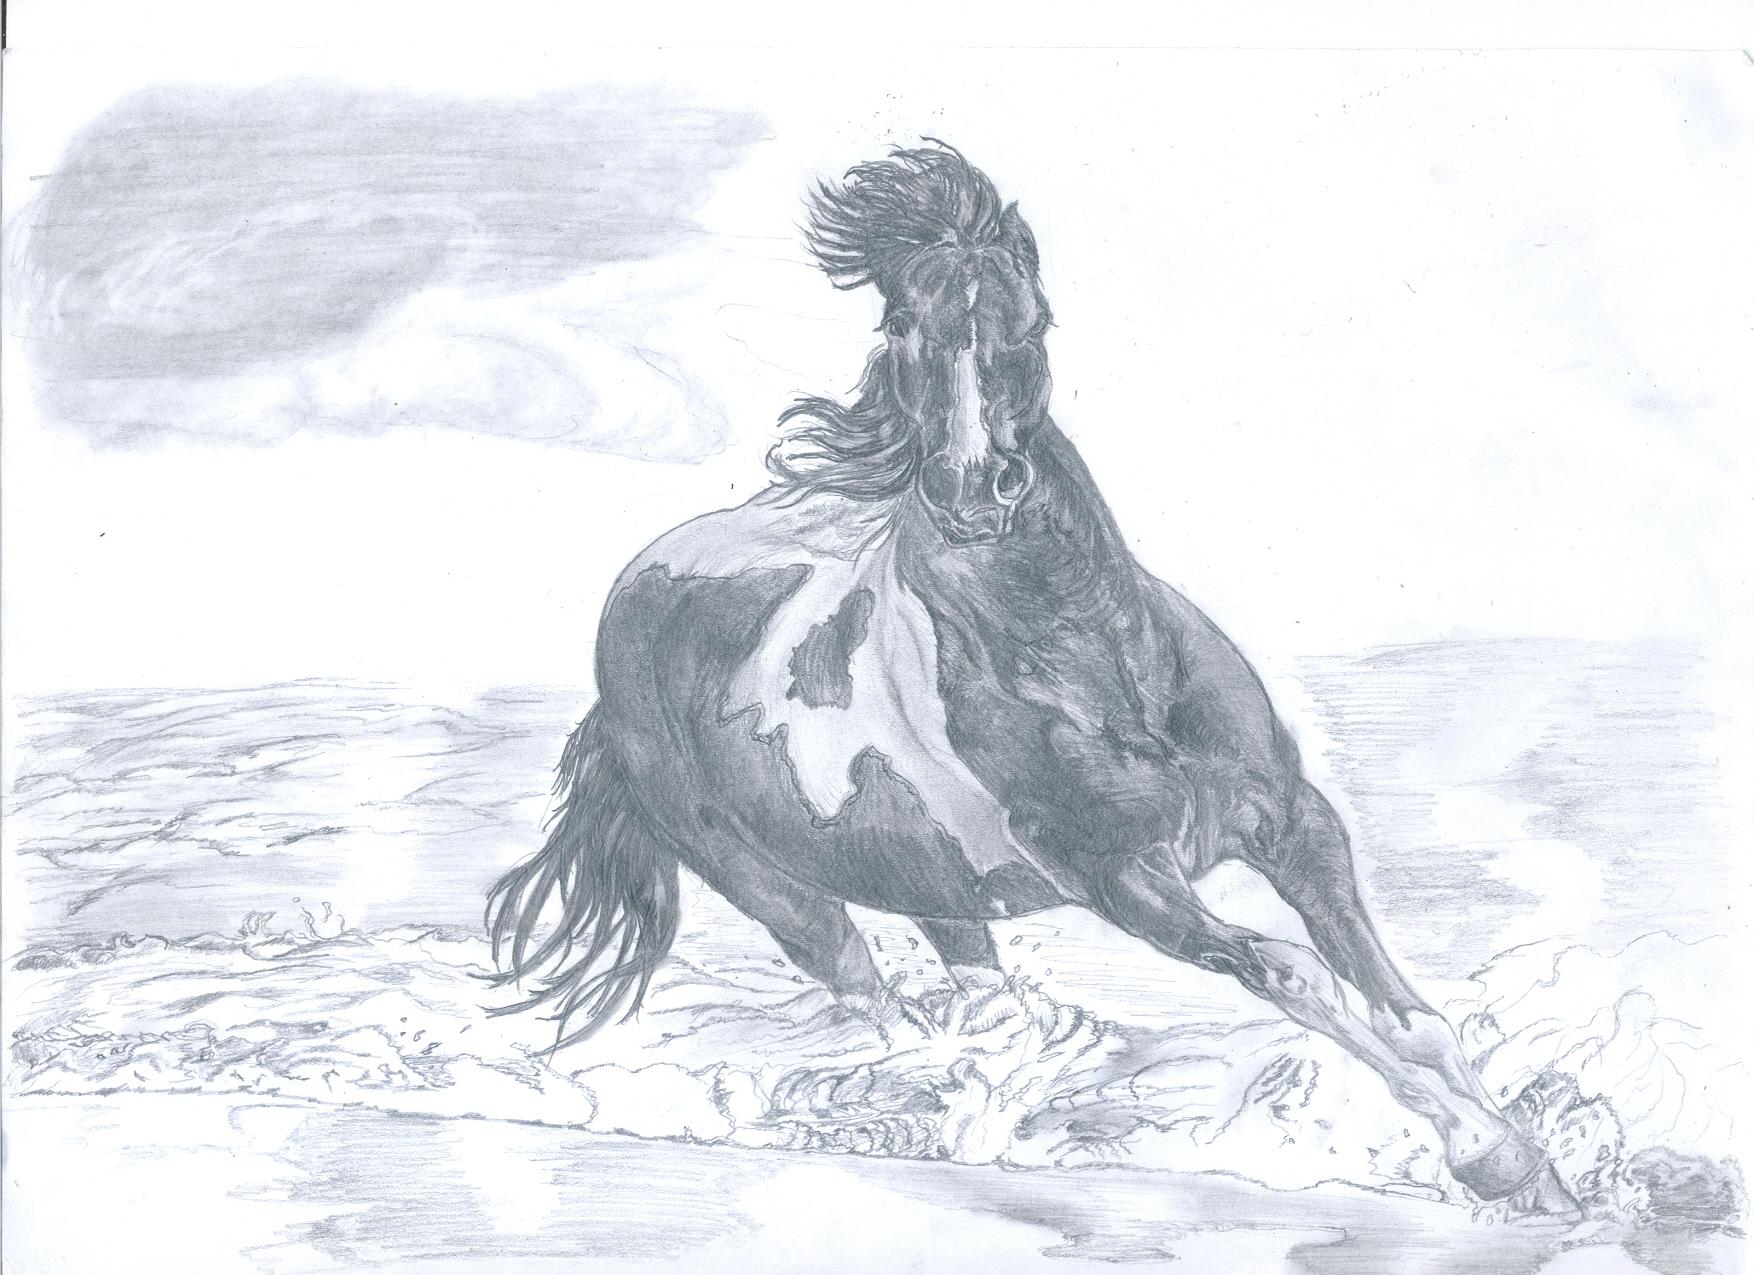 running horse by ivandesign-zecow on DeviantArt